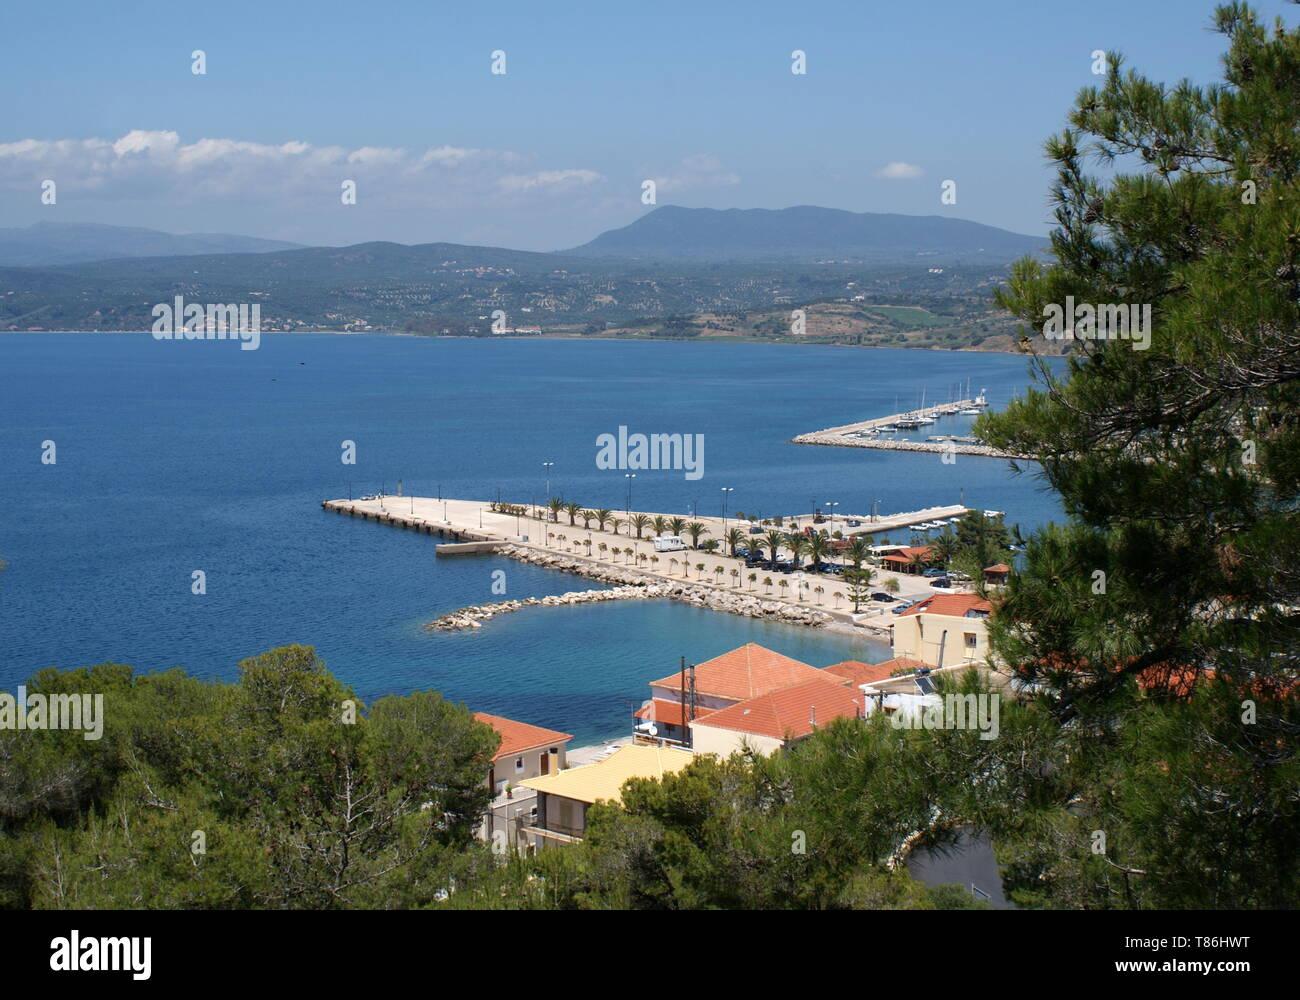 View of Pylos harbour and Navarino bay, Pylos, Peloponnese, Greece - Stock Image